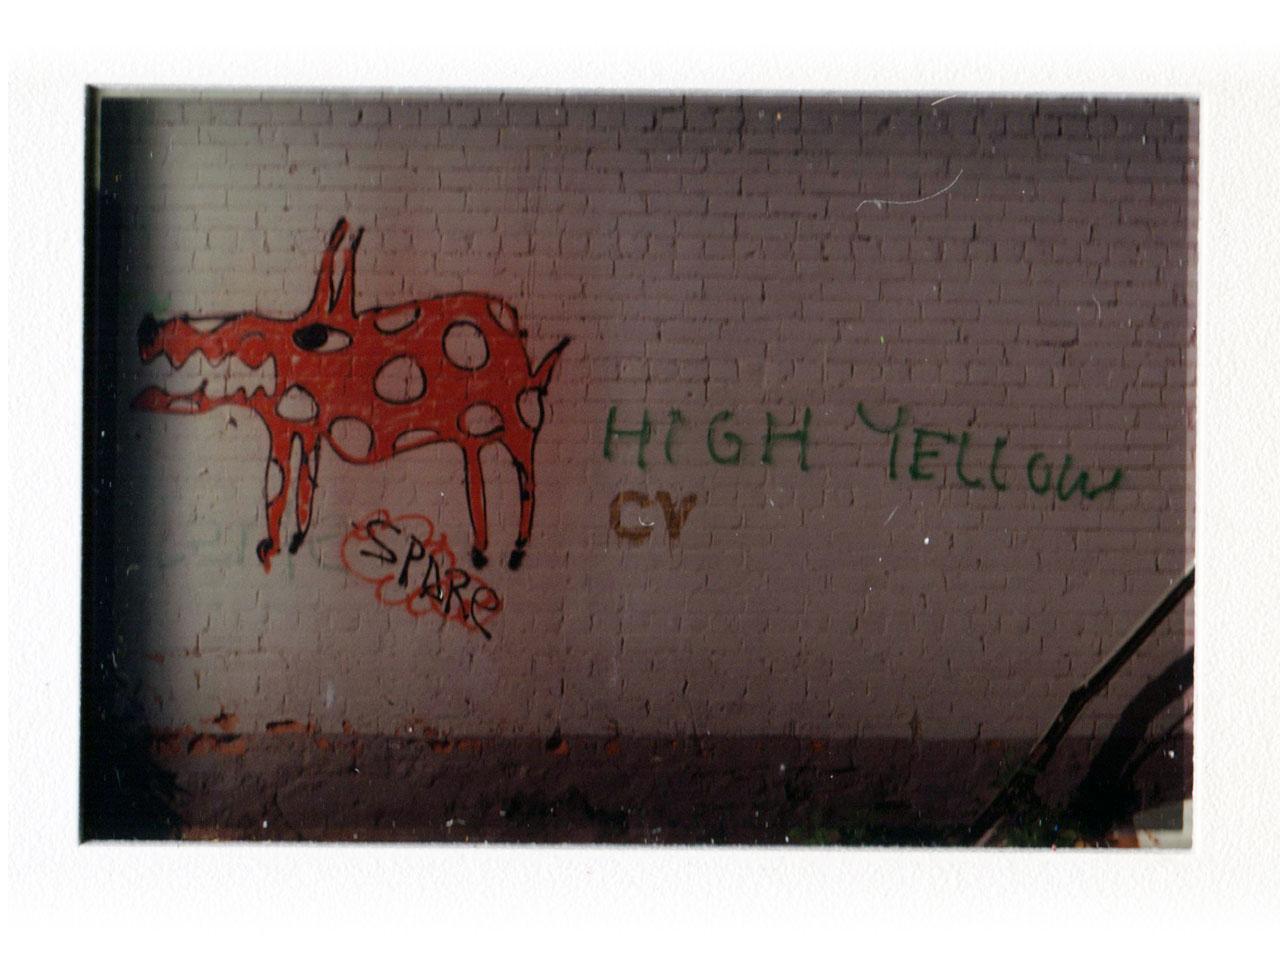 sylvain-pare-spare-artwork-1280x1280_00-graffitti-03.jpg